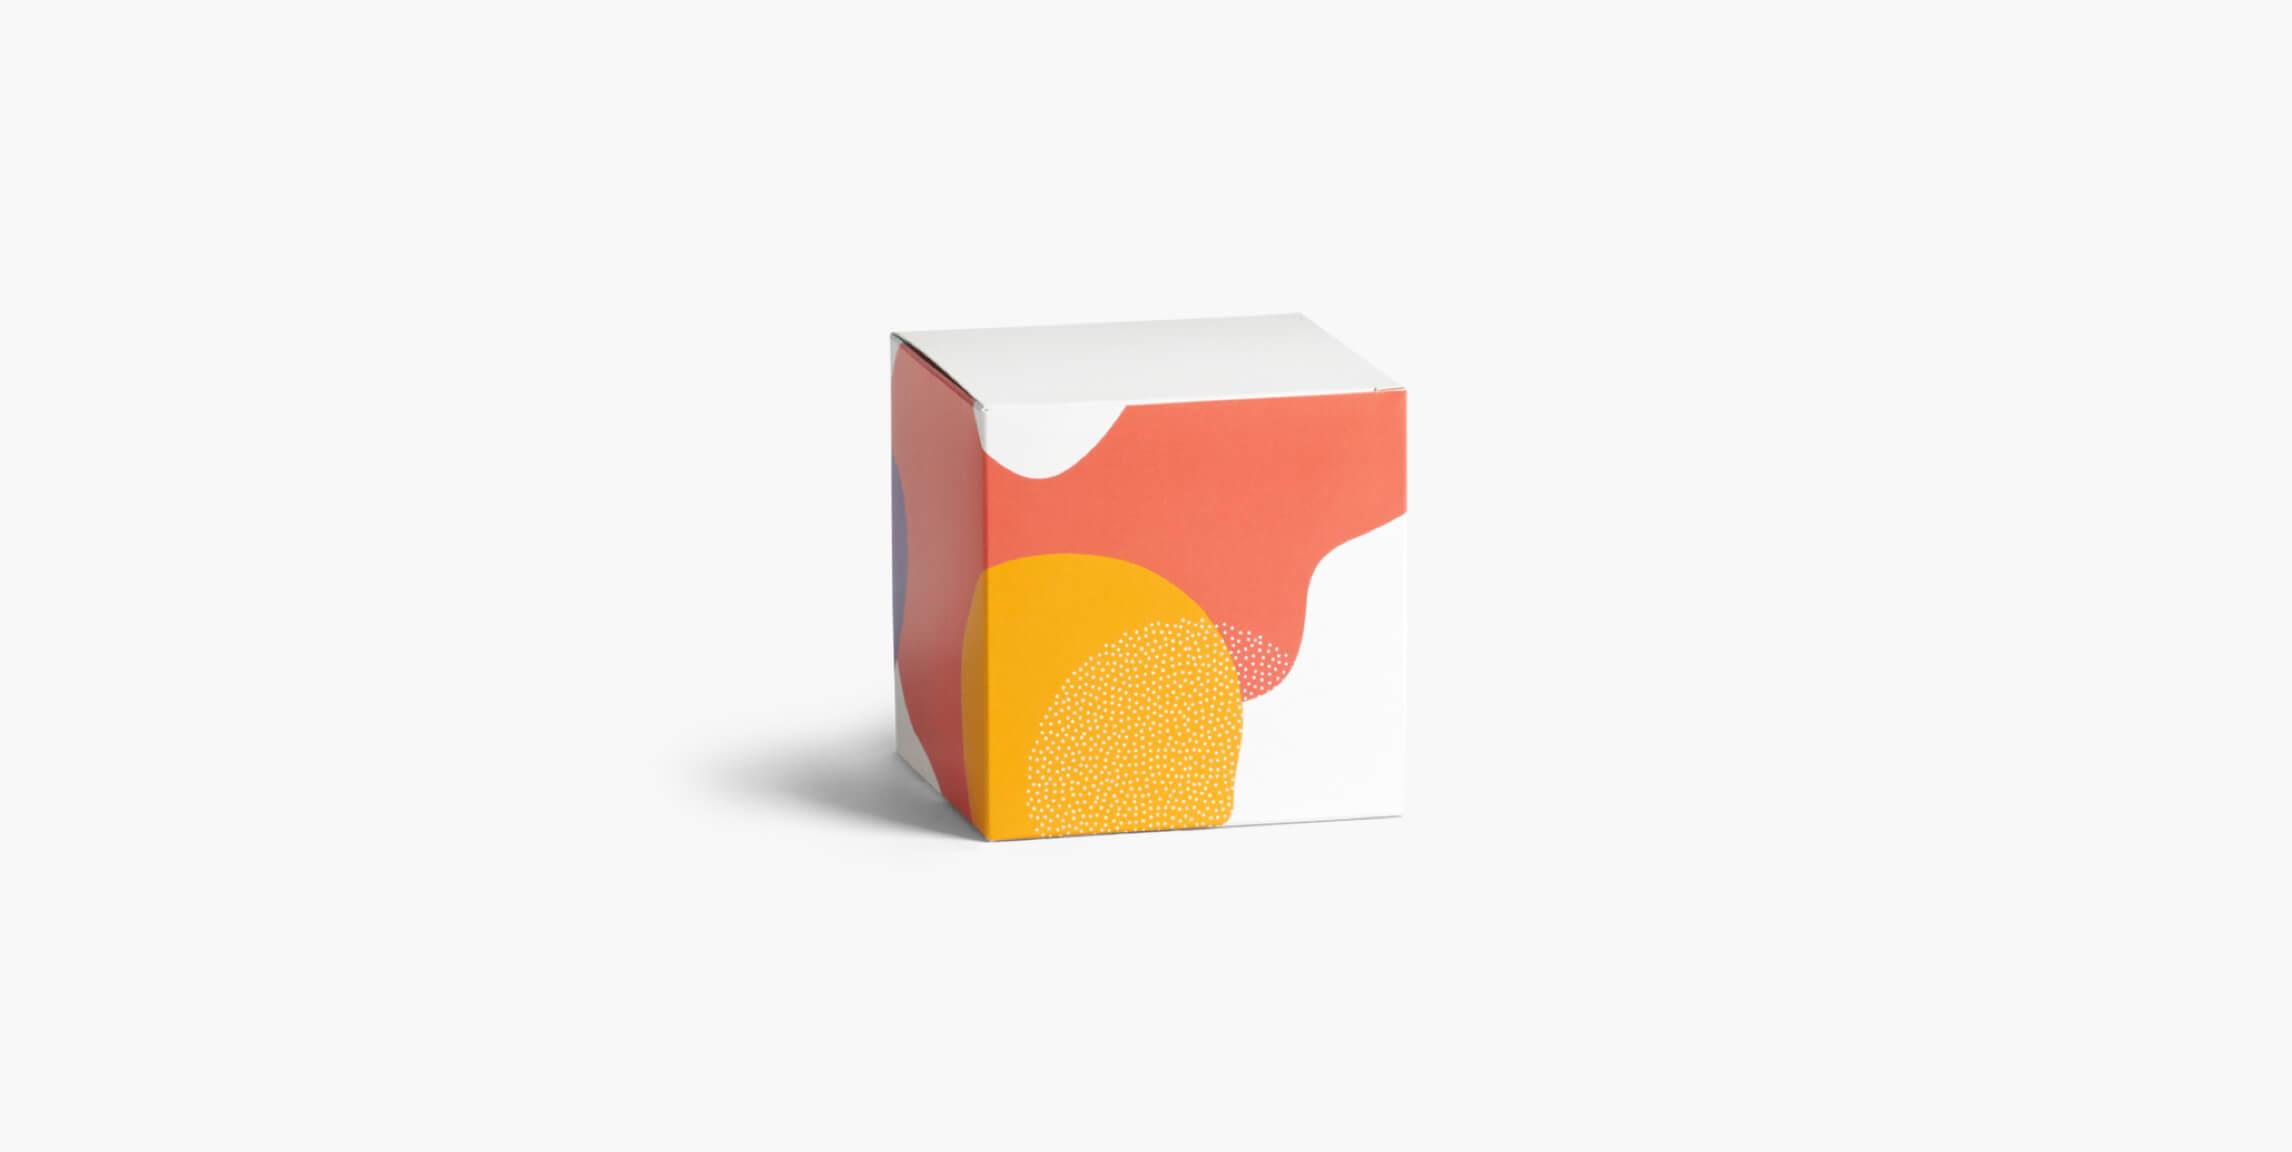 73ffb5a23ccc Caja para productos classic - paqueteria personalizada para empresas -  Packhelp